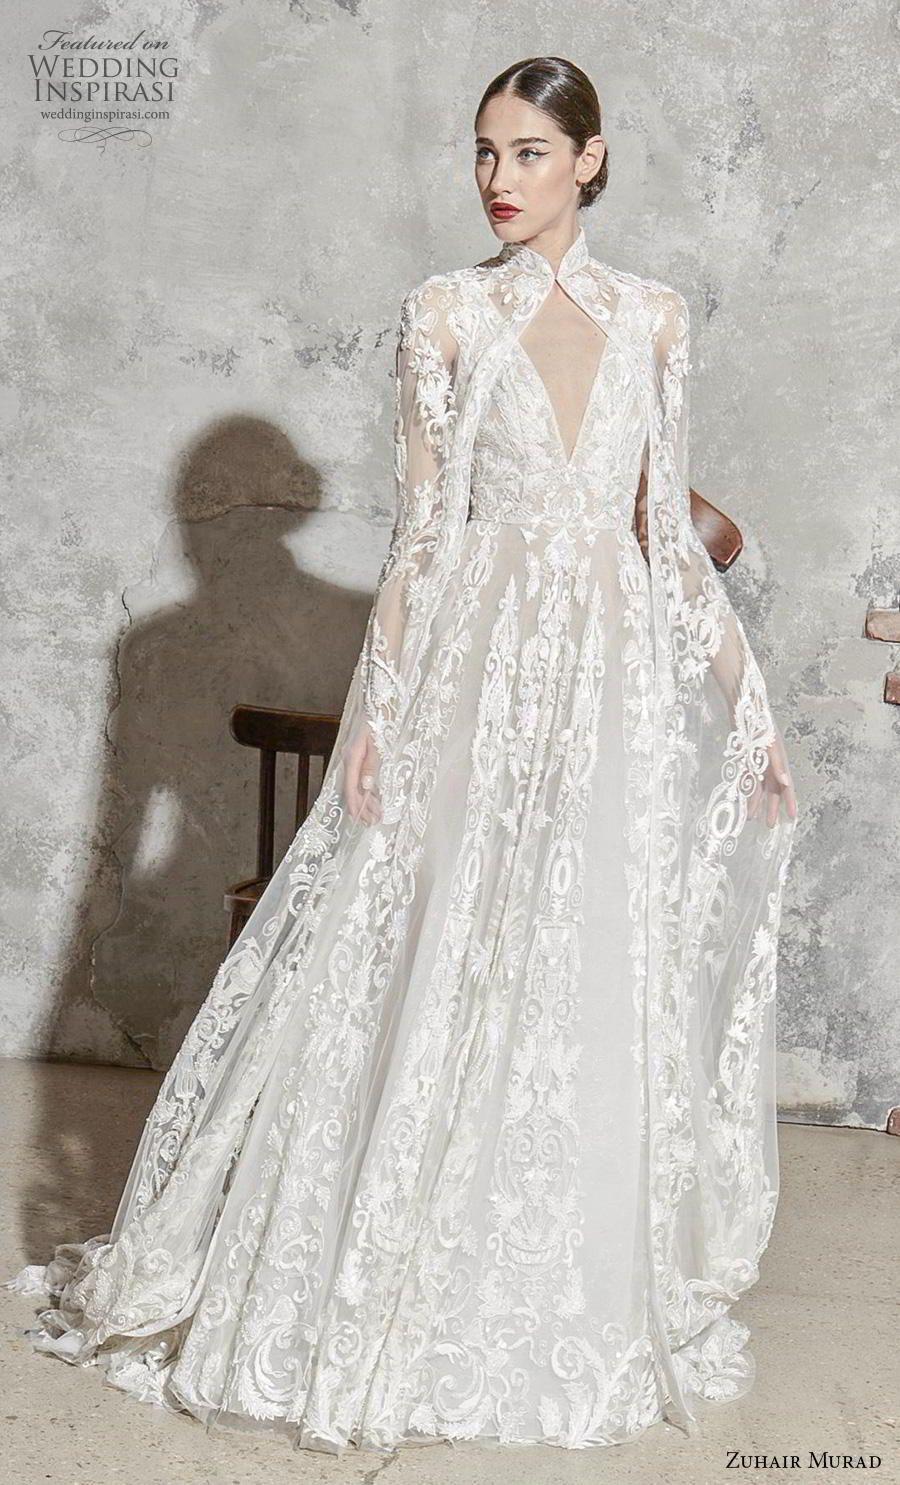 Zuhair Murad Spring 2020 Wedding Dresses Wedding Inspirasi Wedding Dress Trends Zuhair Murad Bridal Winter Wedding Dress [ jpg ]